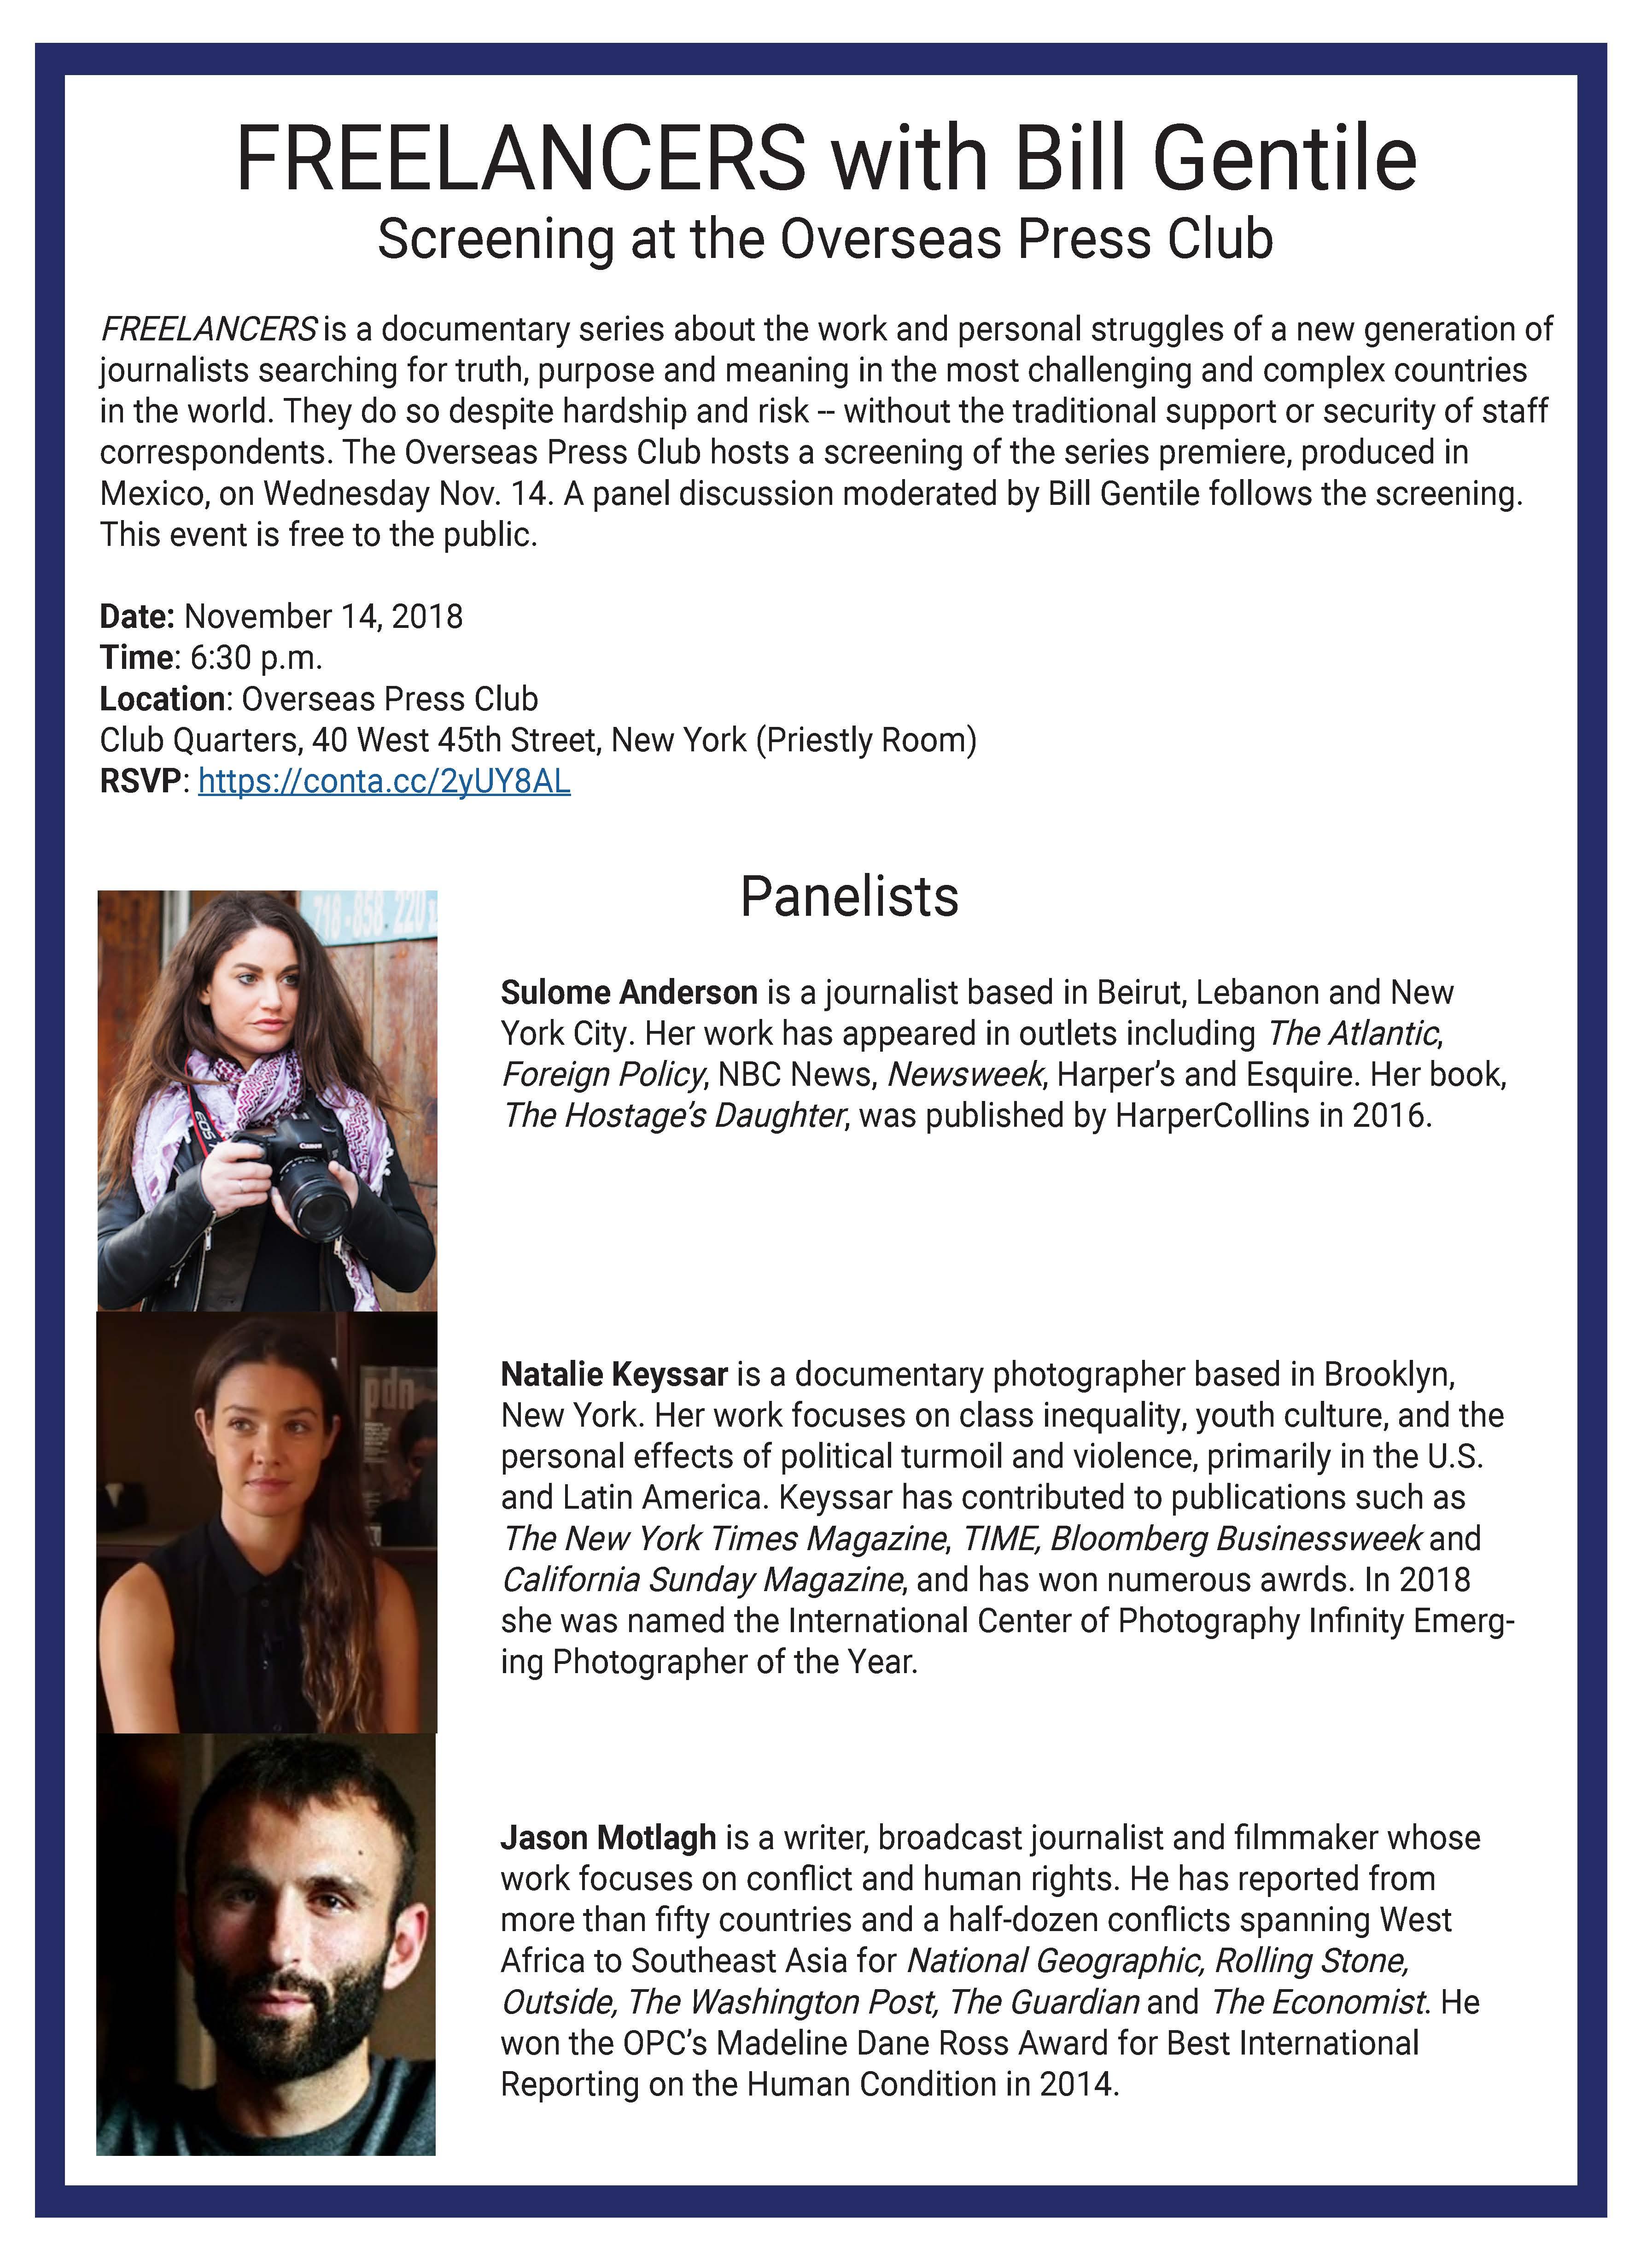 panelists 9 November 2018